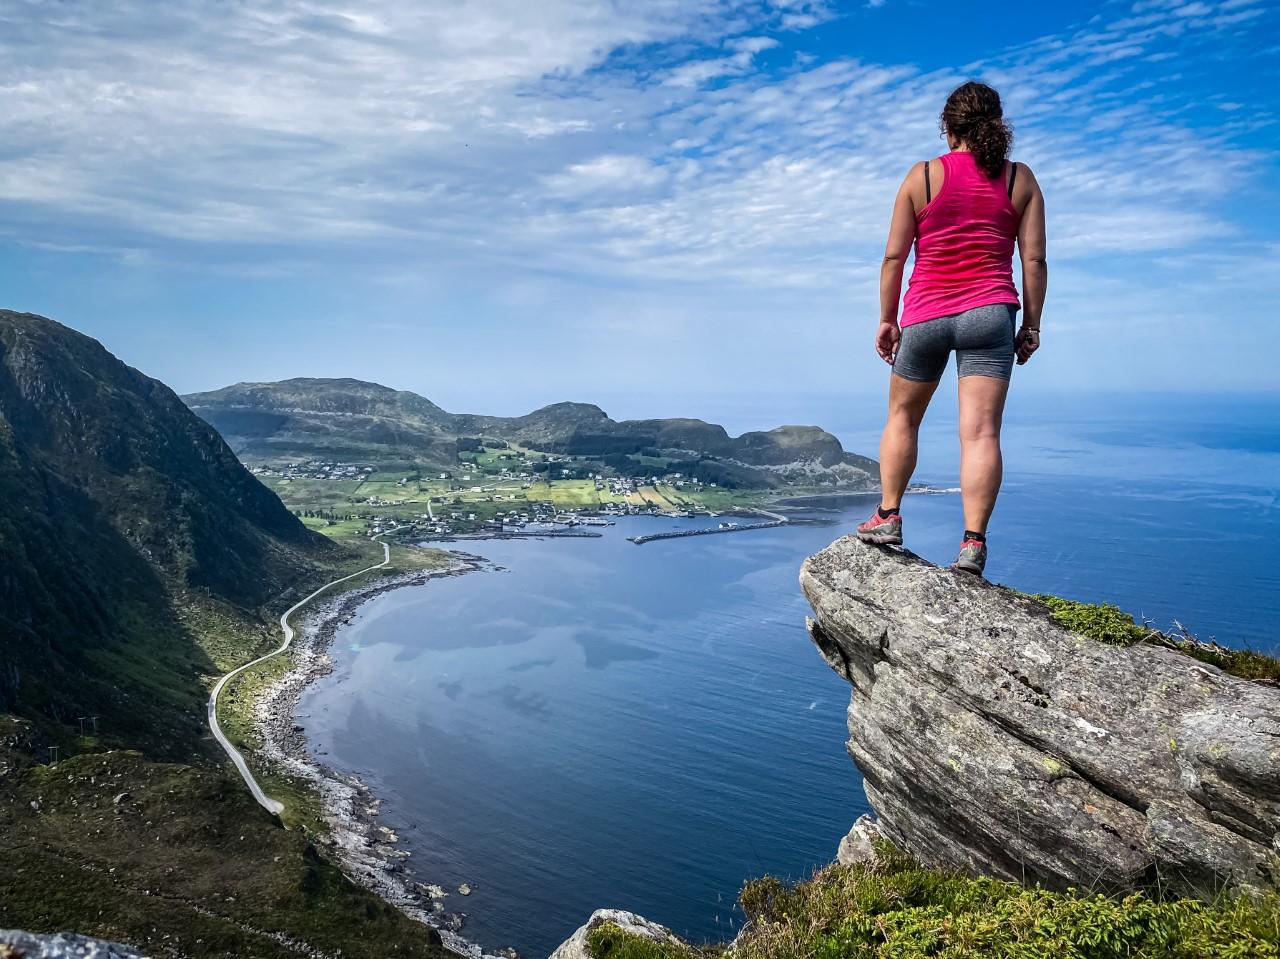 Runde Havlandet Fosnavaag reisegude reiseapp lydguide app mobilguide Voice Of Norway Foto Gard Warholm